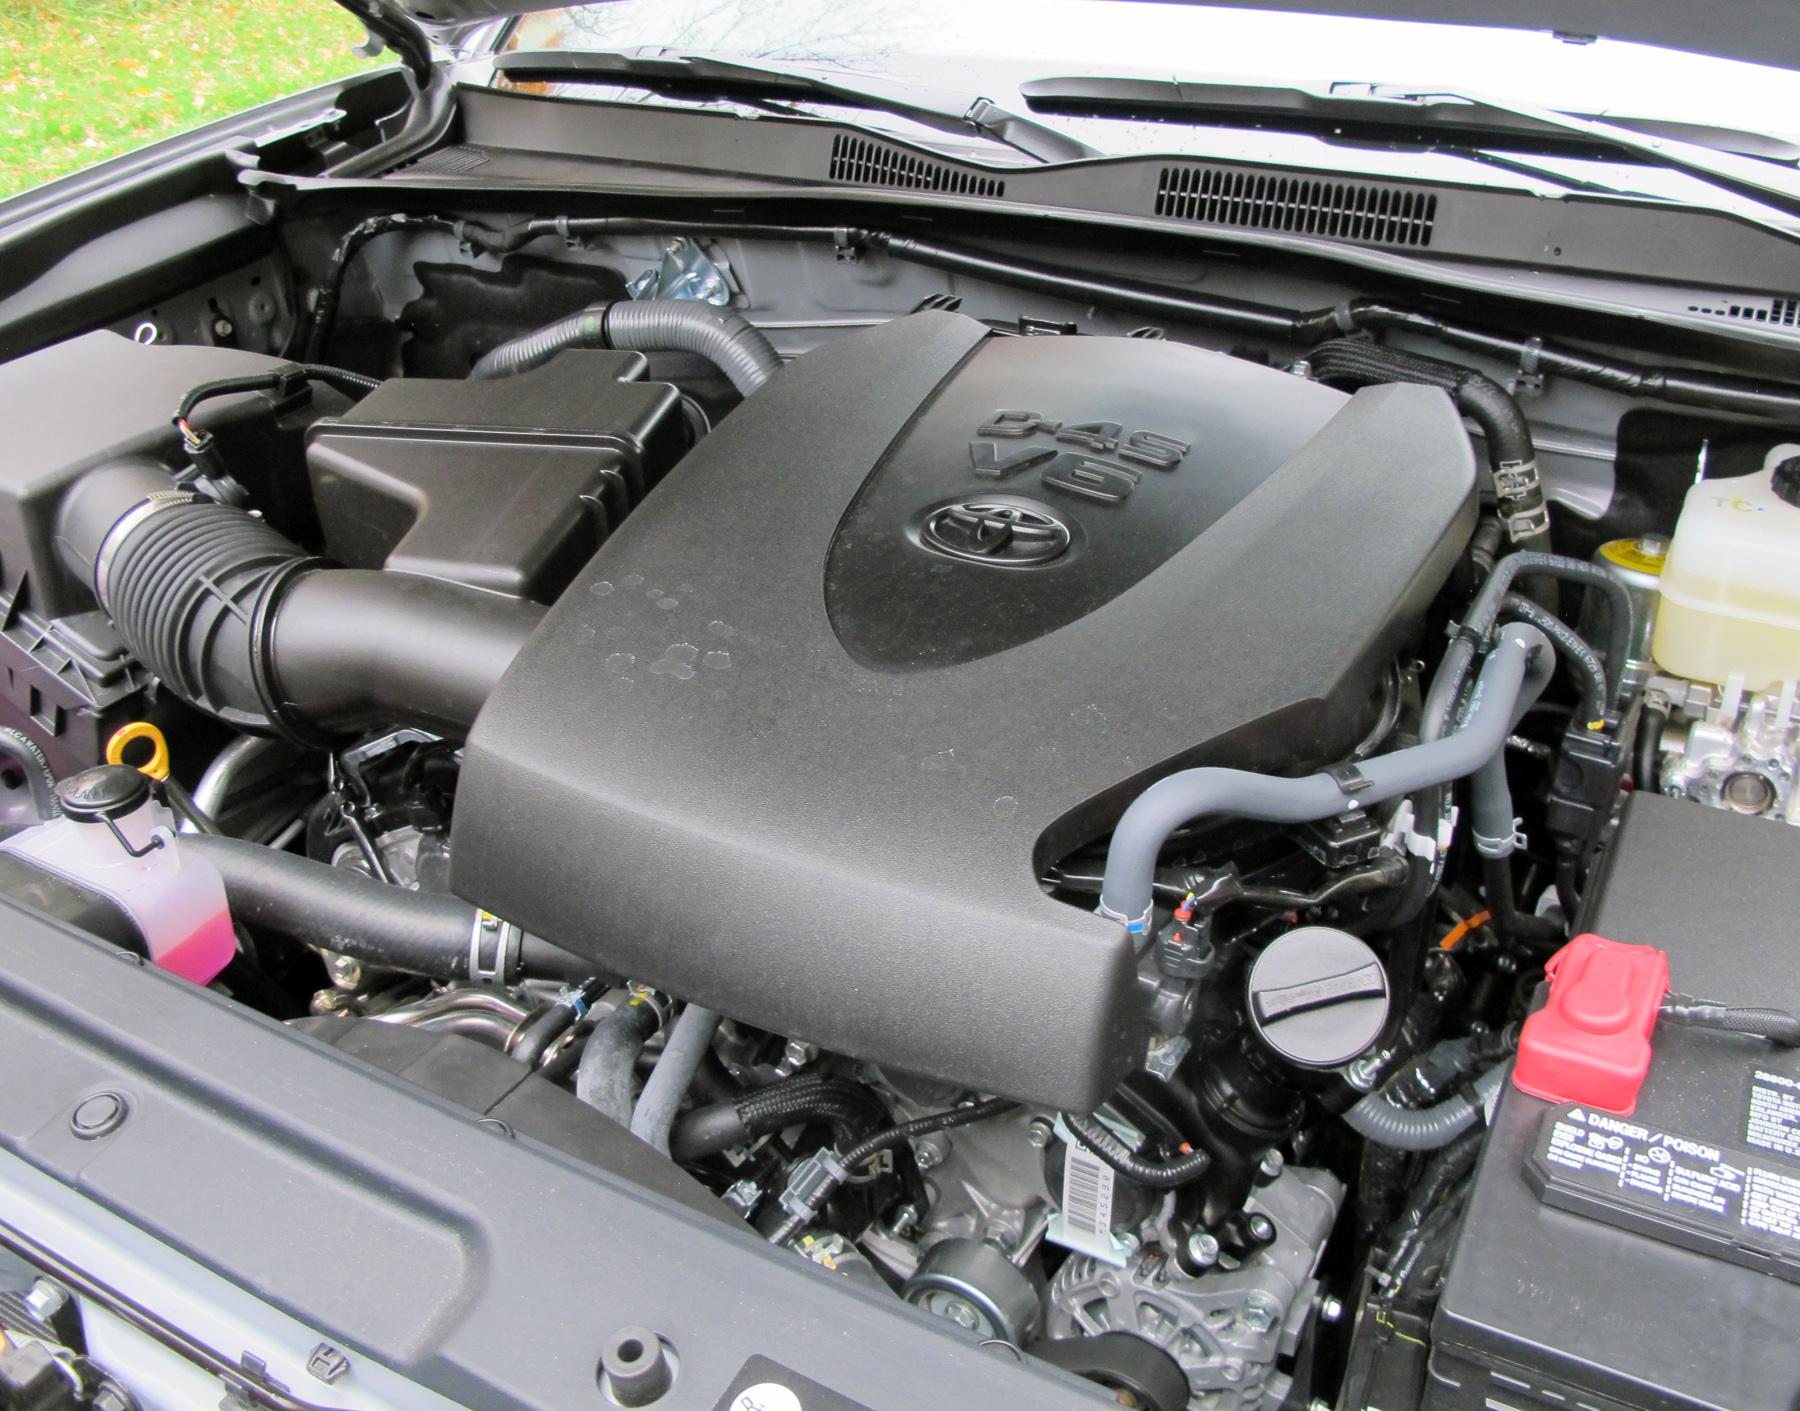 Toyota Tacoma TRD-Pro